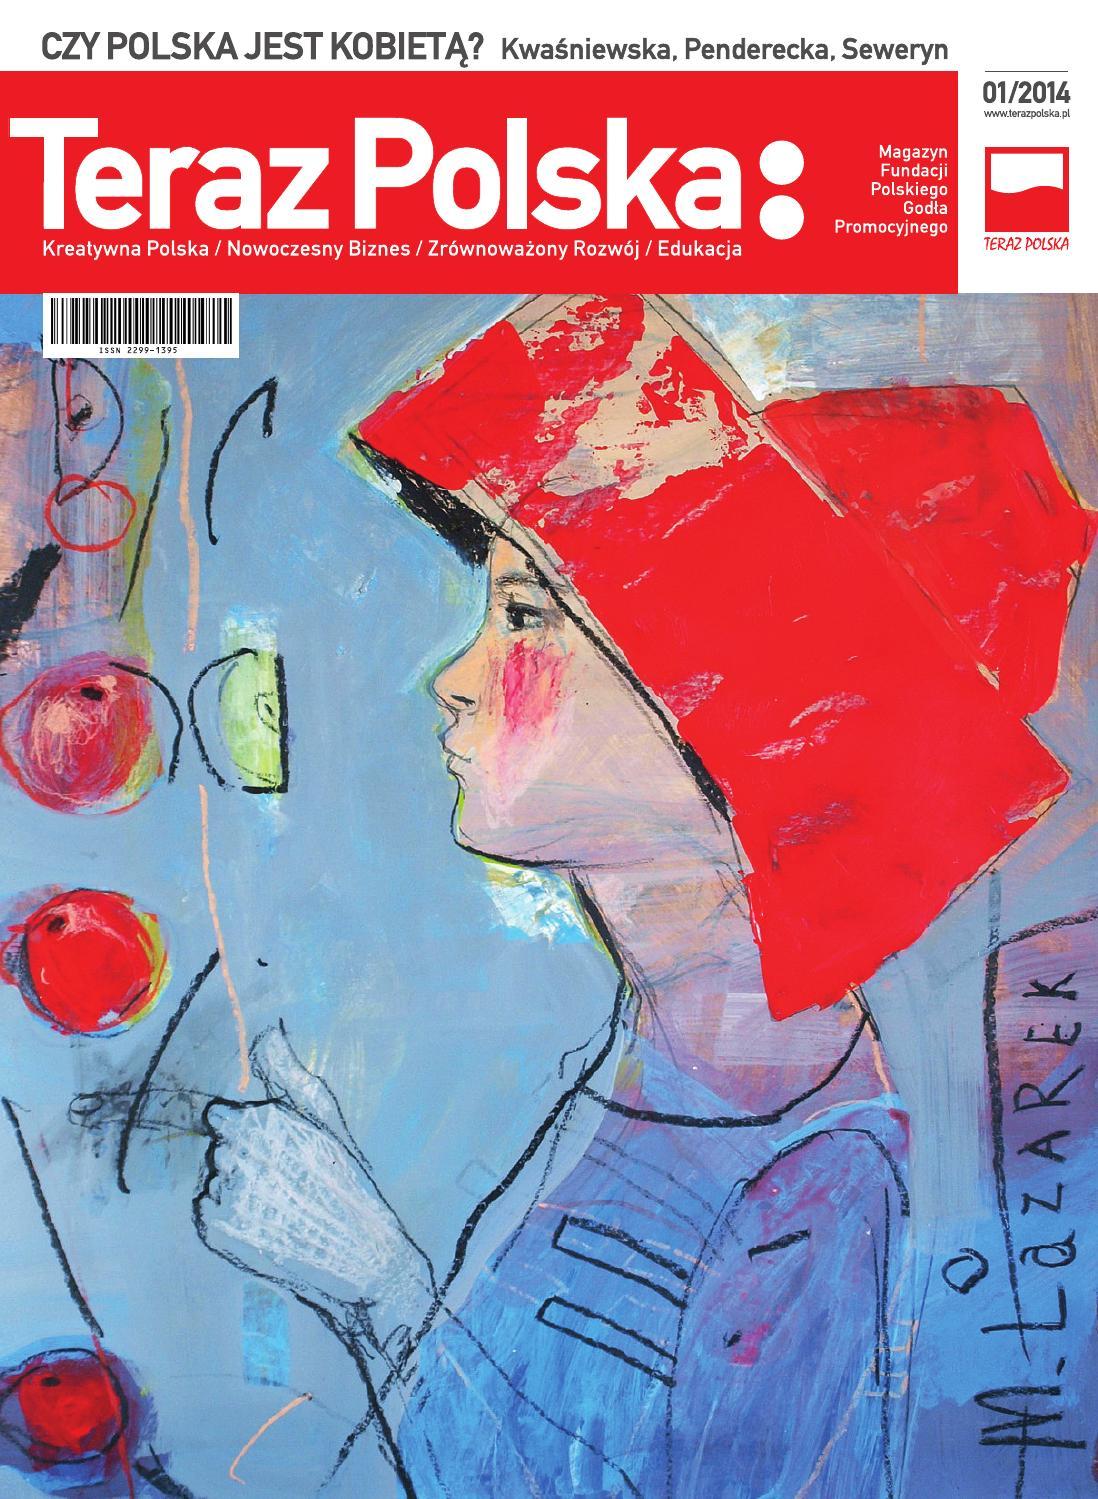 195c8842ee4 Magazyn TERAZ POLSKA: nr. 8 (1/2014) by Best Place Institute - issuu